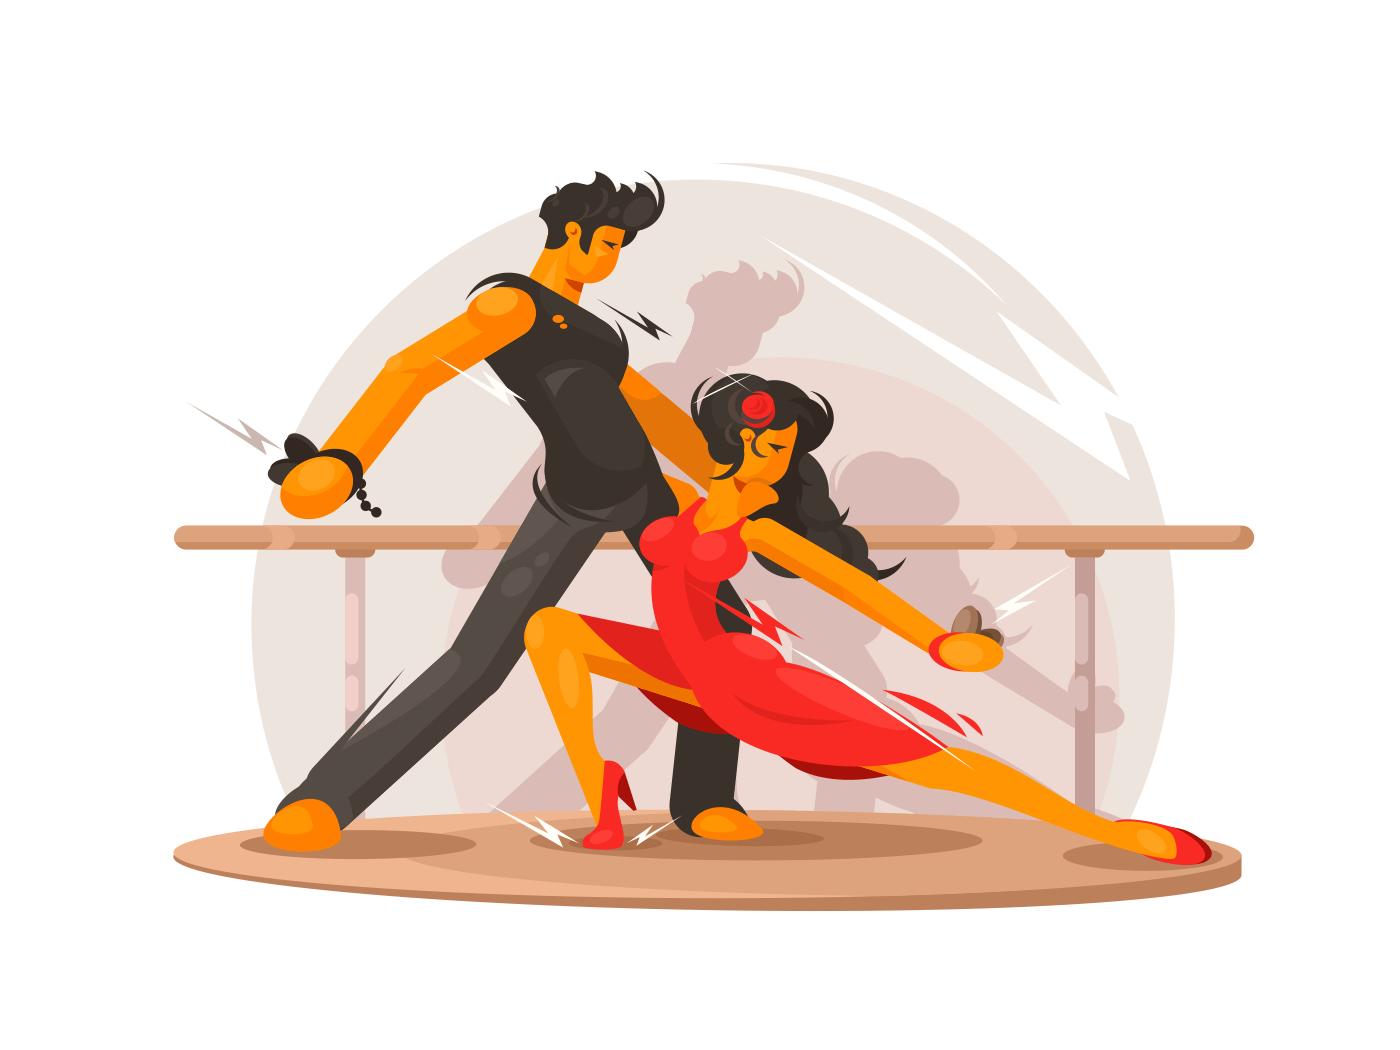 Dancing school illustration